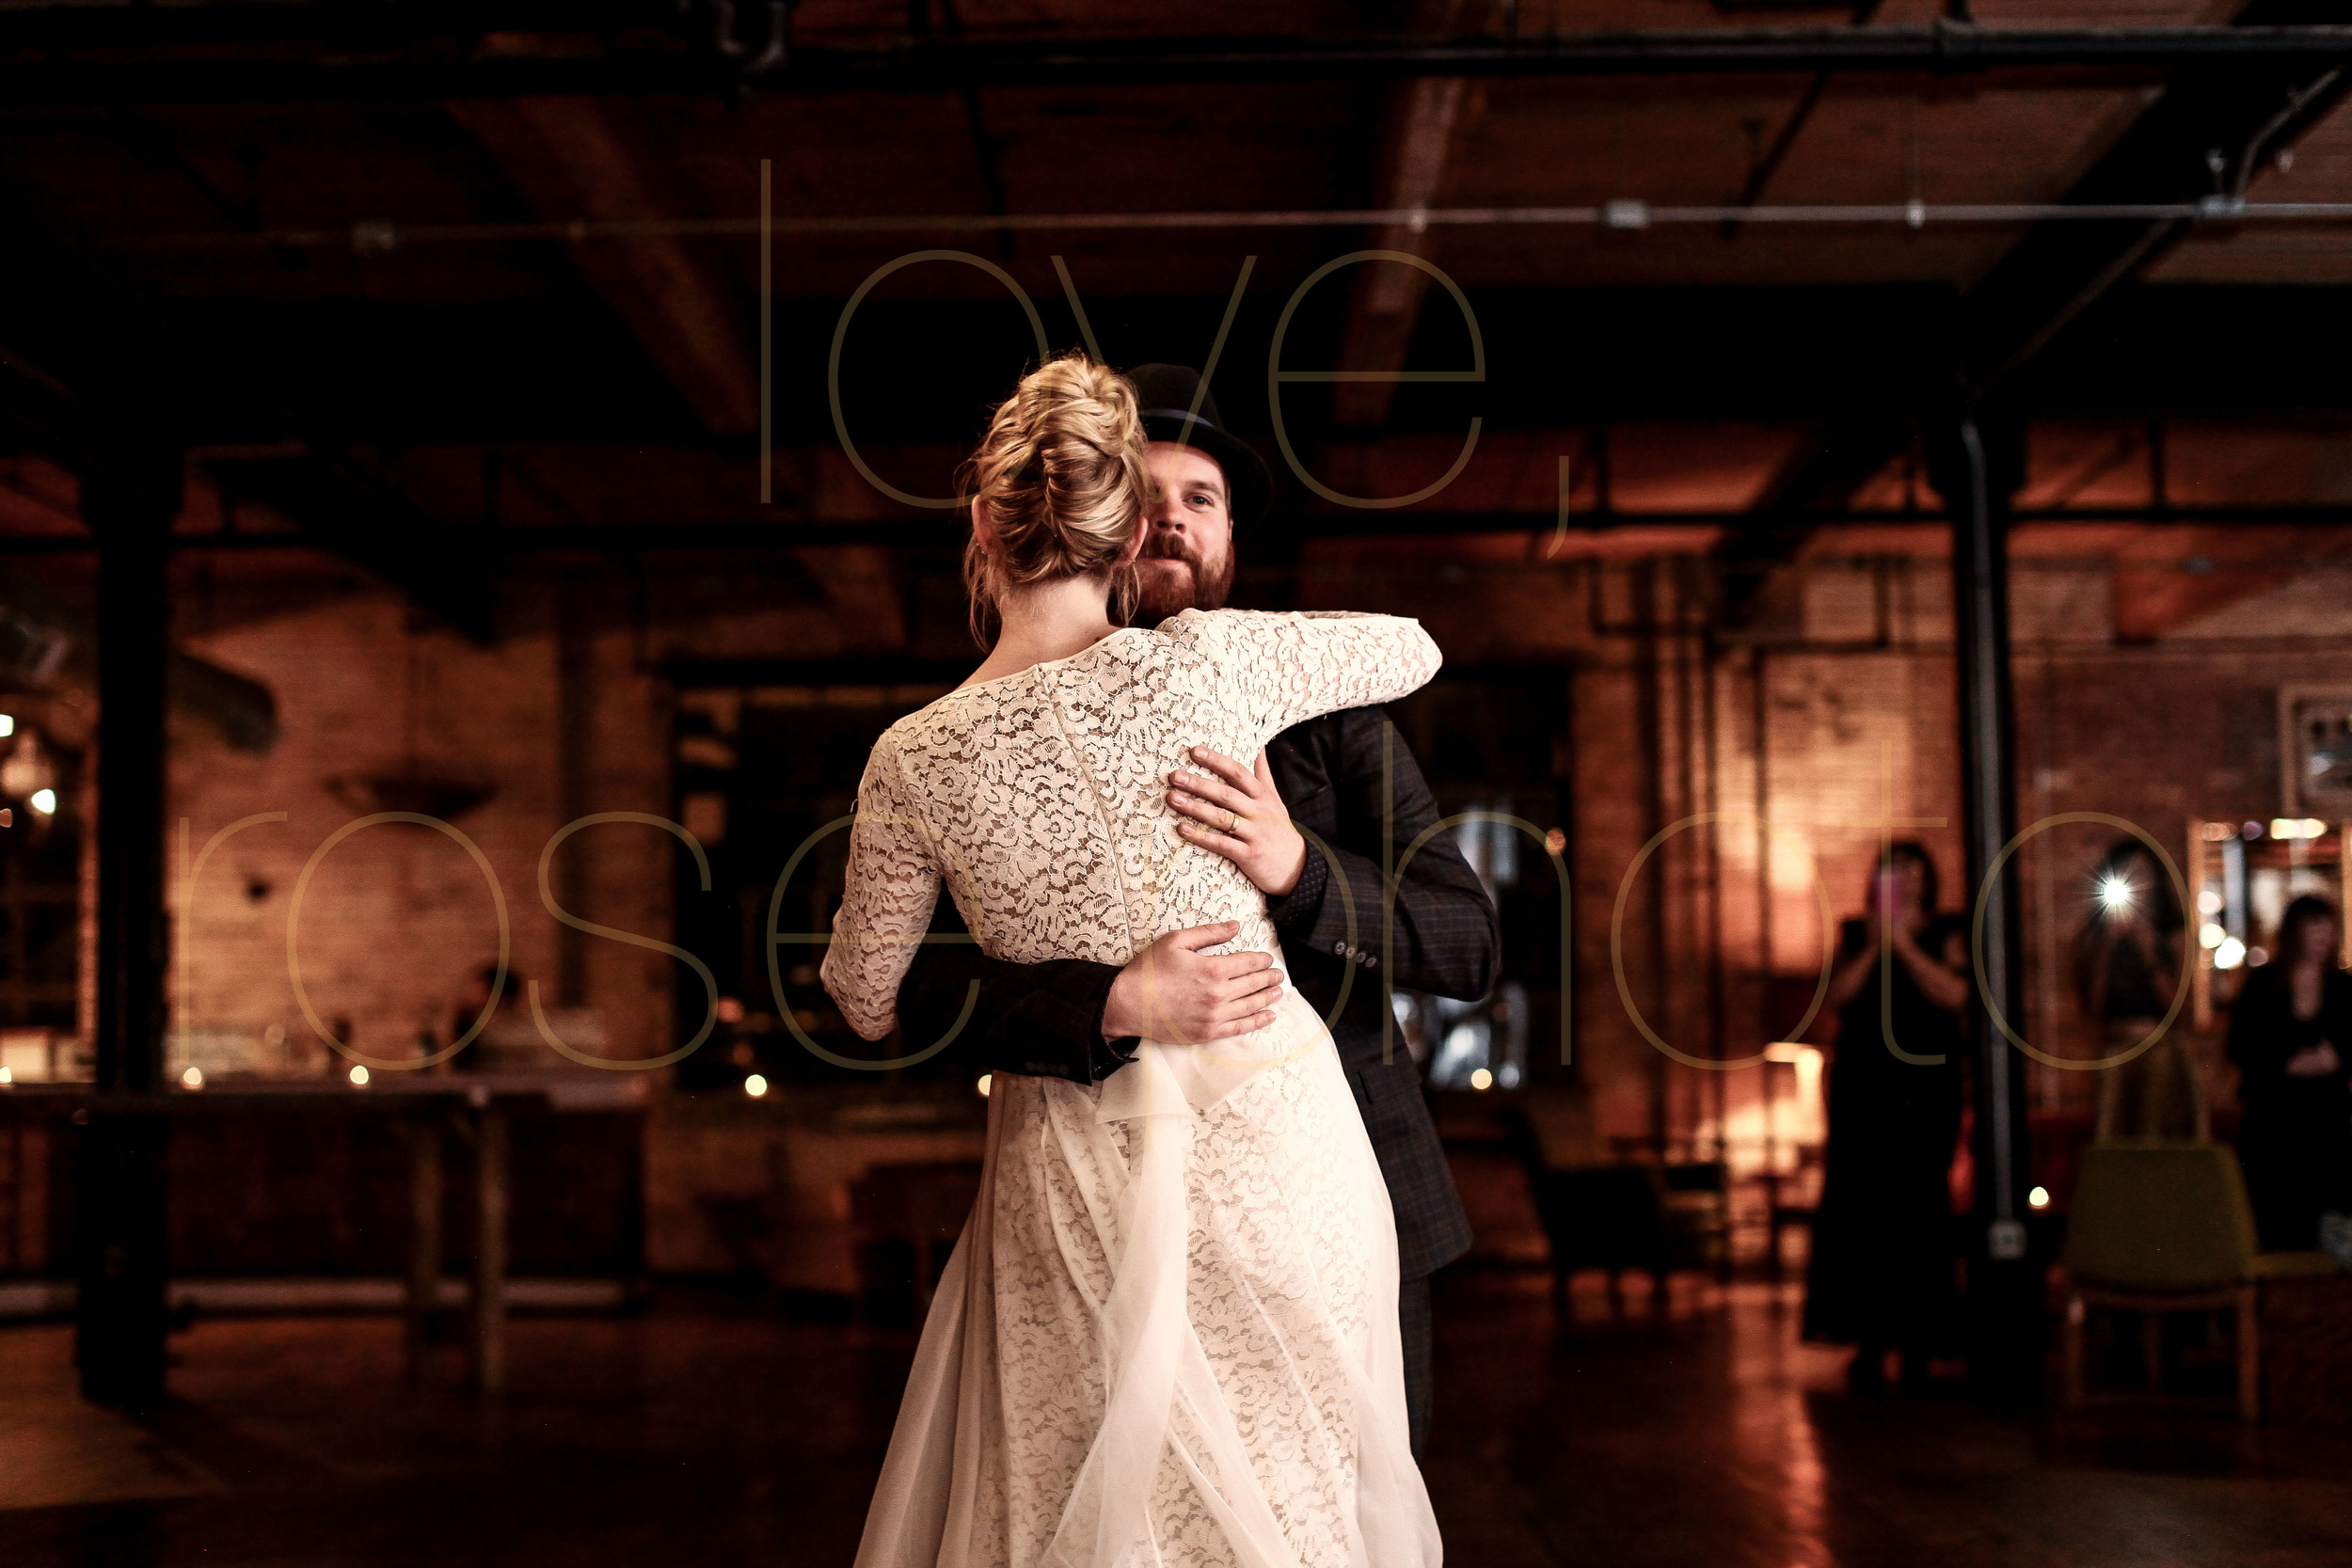 West Fulton Chicago Wedding Venue Salvage One photography enagement photos bride groom first dance-32.jpg